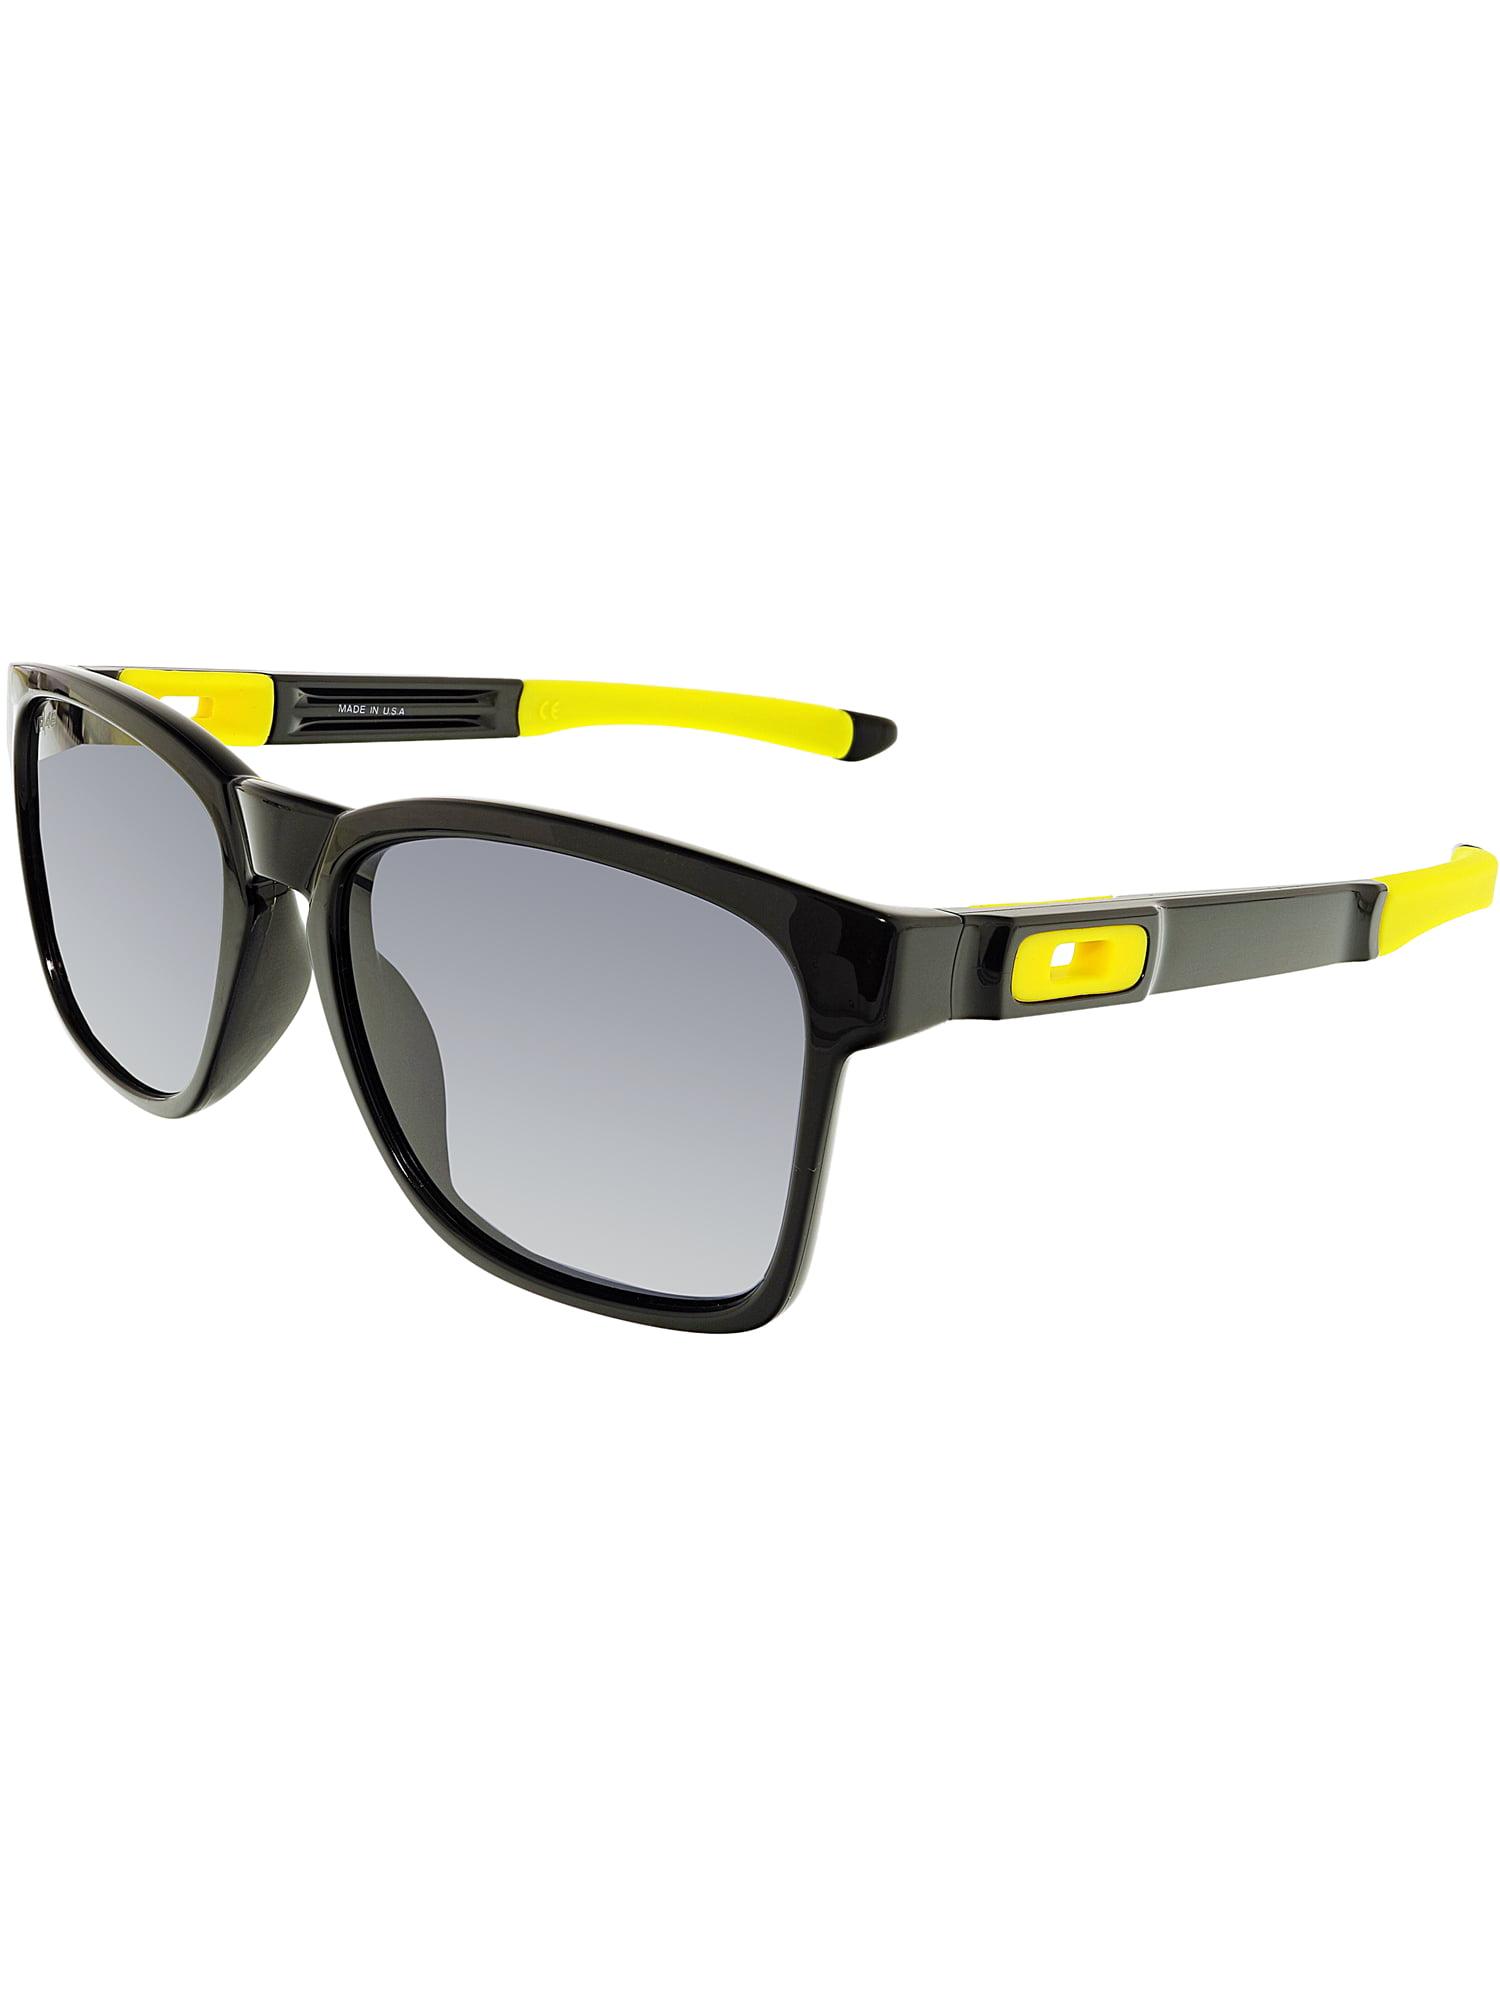 79bd747756 ... switzerland oakley mens catalyst prizm oo9272 17 black square sunglasses  69160 b41a1 ...